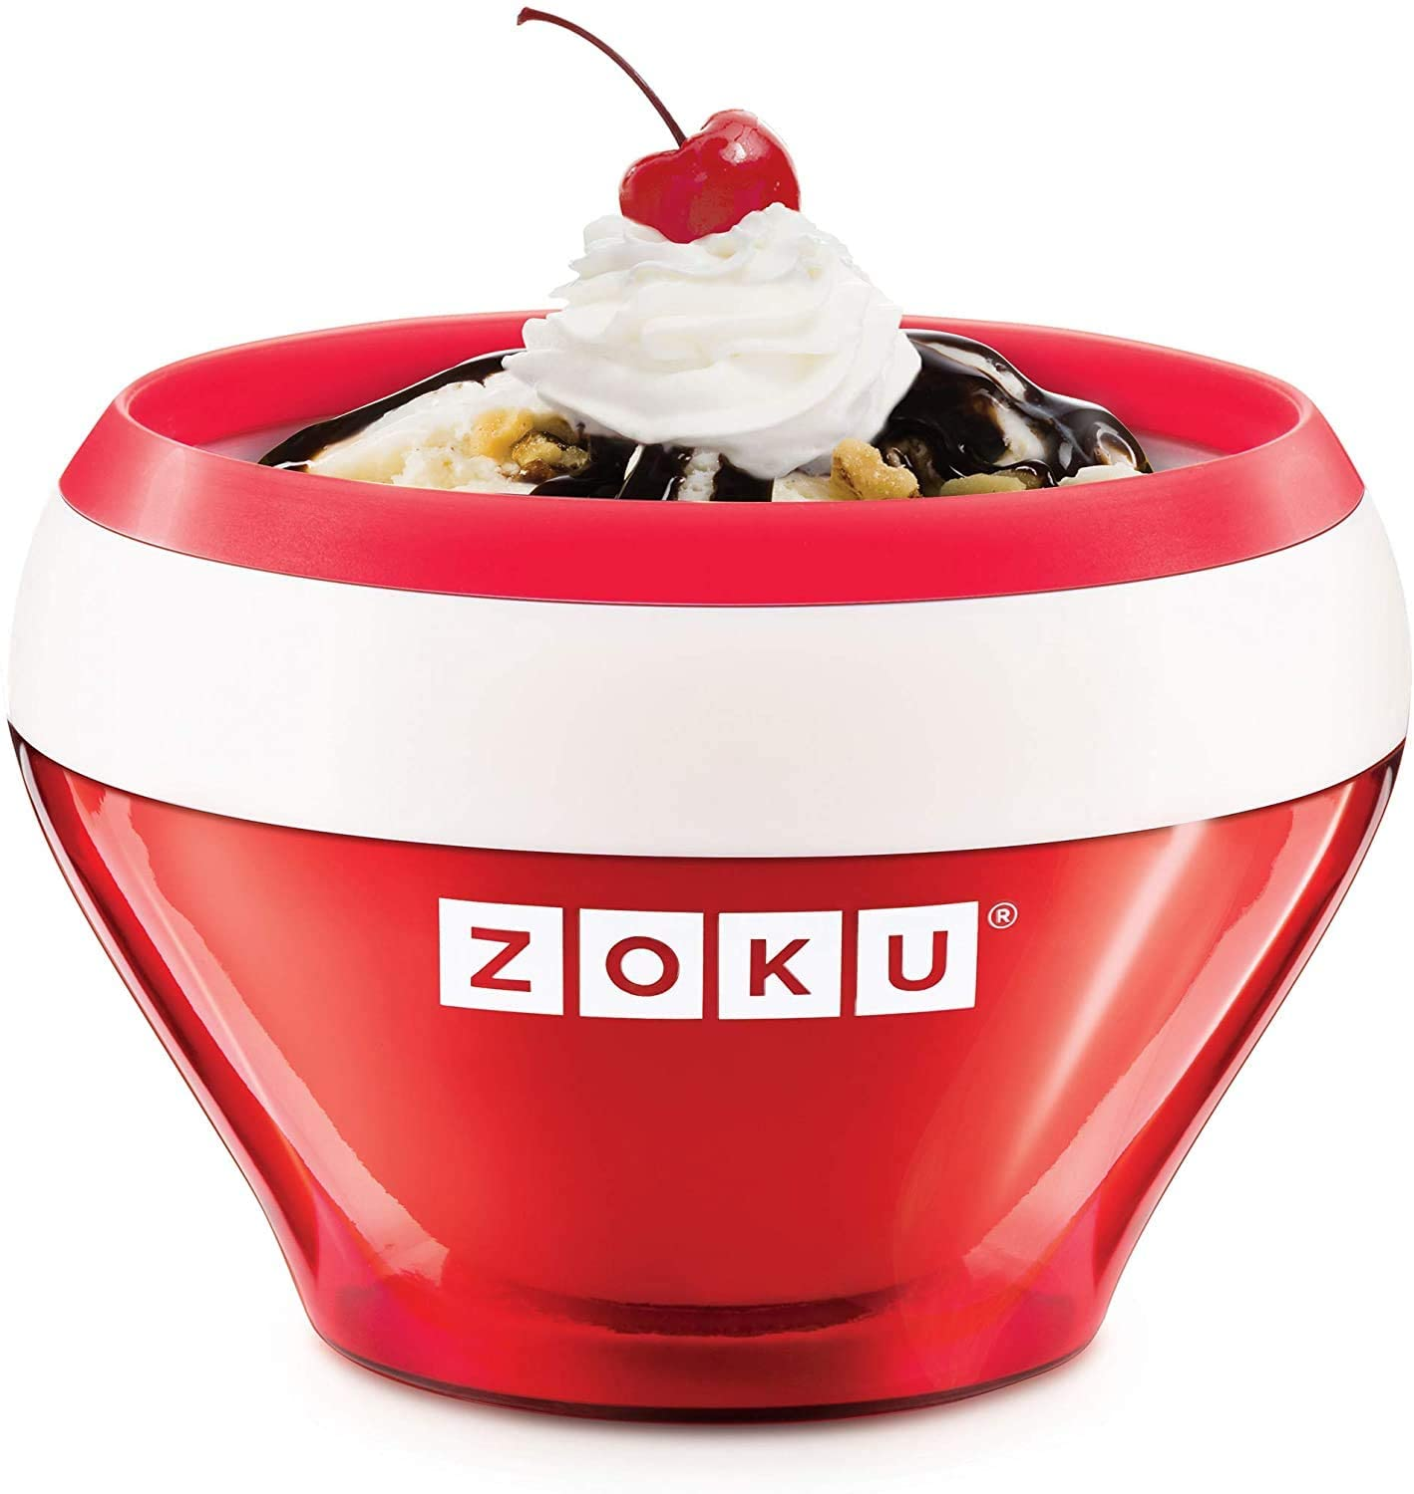 Zoku Coca-Cola Float  Slushy Maker Retro Make And Serve Cup With Freezer Core